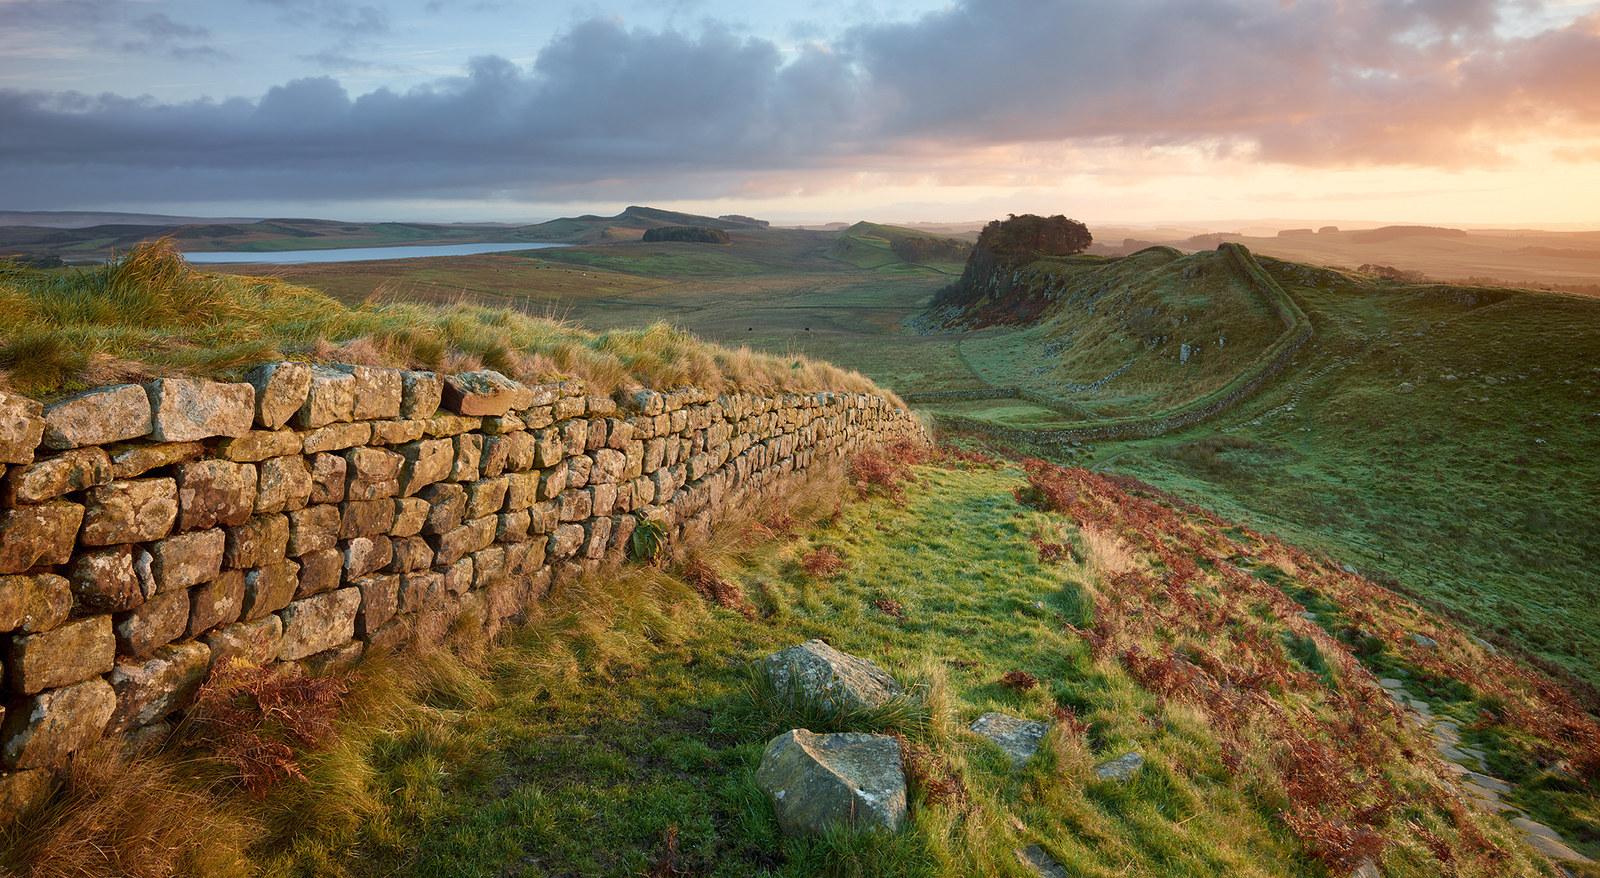 3. Hadrian's Wall, Northumberland.